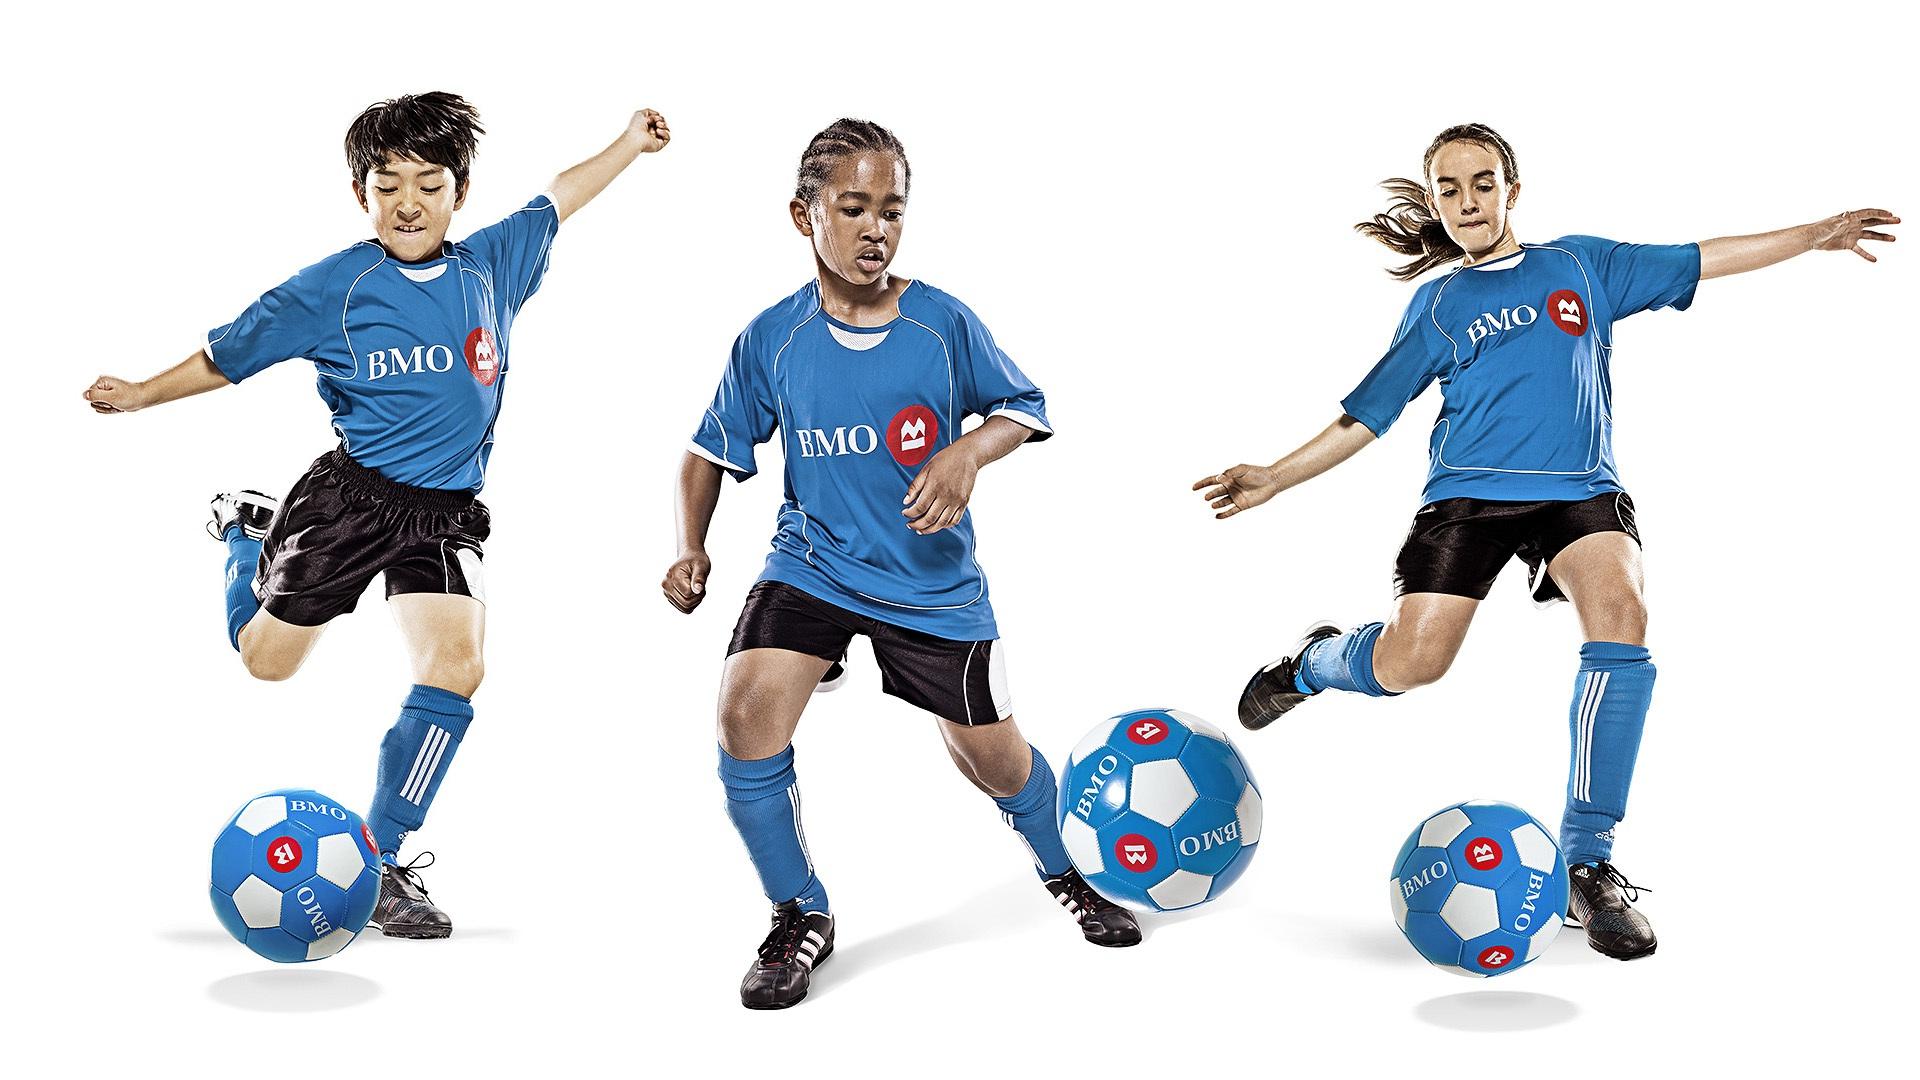 Kids Football Wallpaper: Cute Soccer Wallpapers